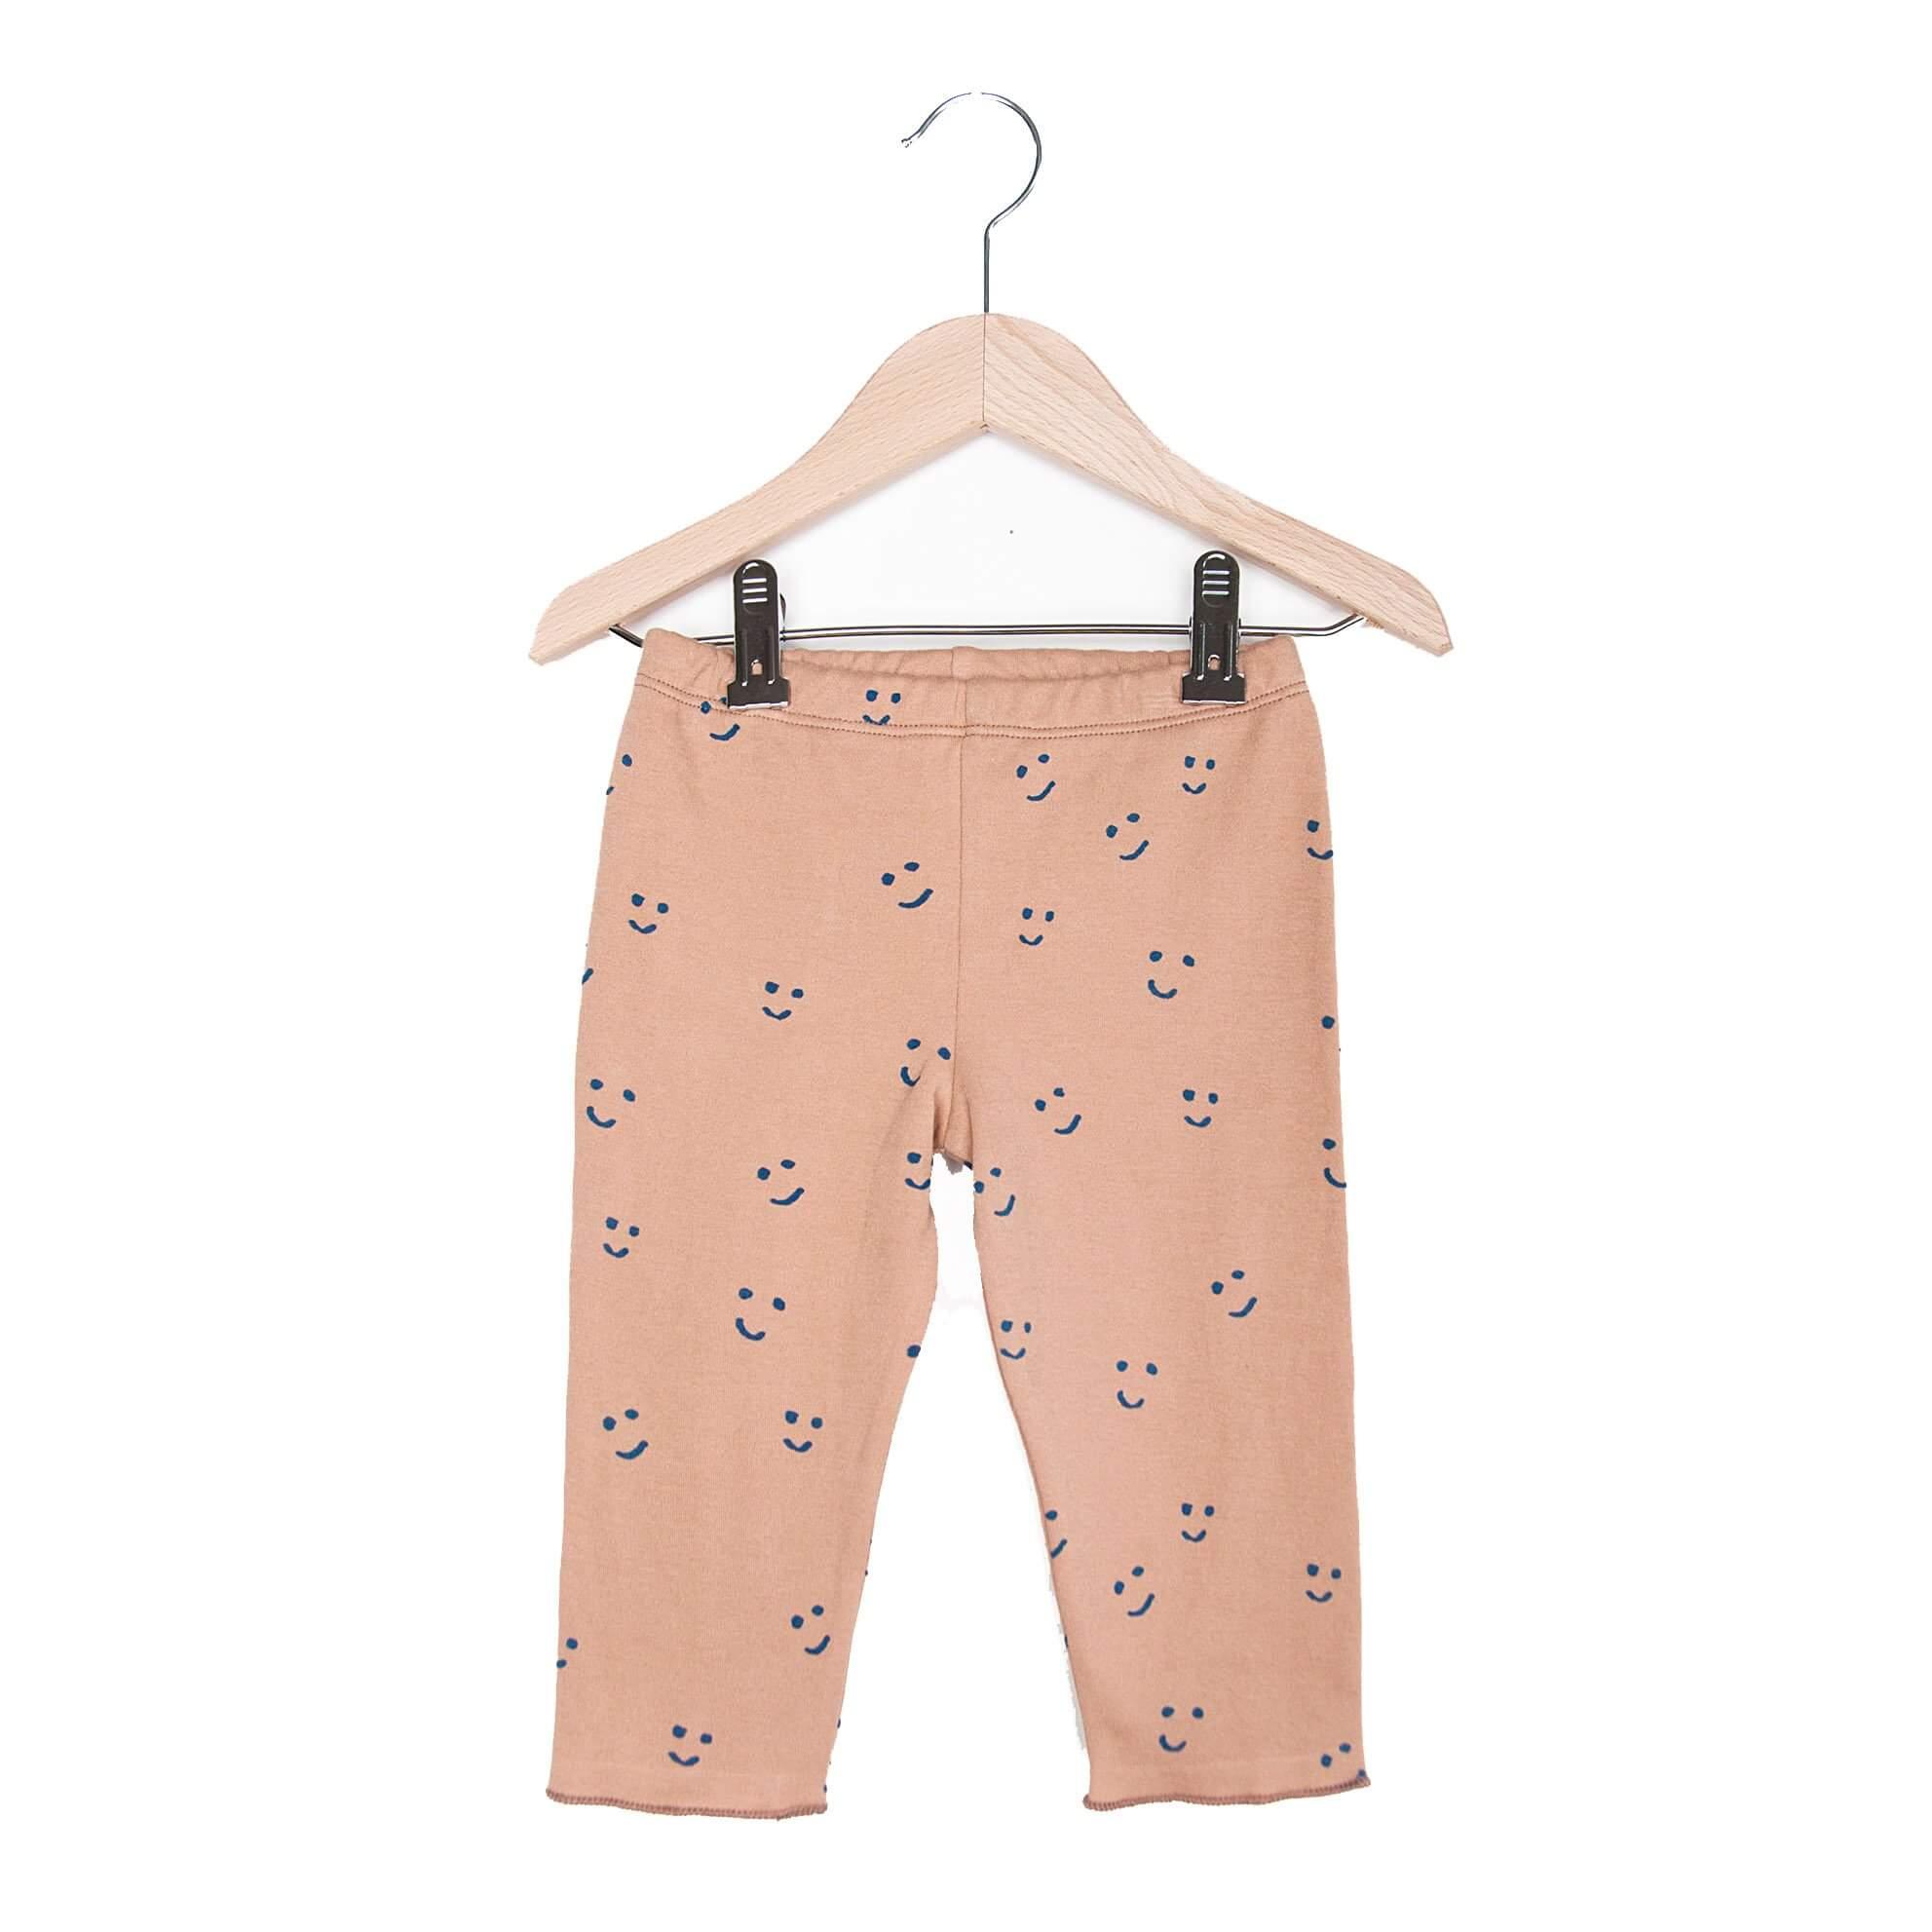 NADADELAZOS baby leggings Happy faces, organic cotton